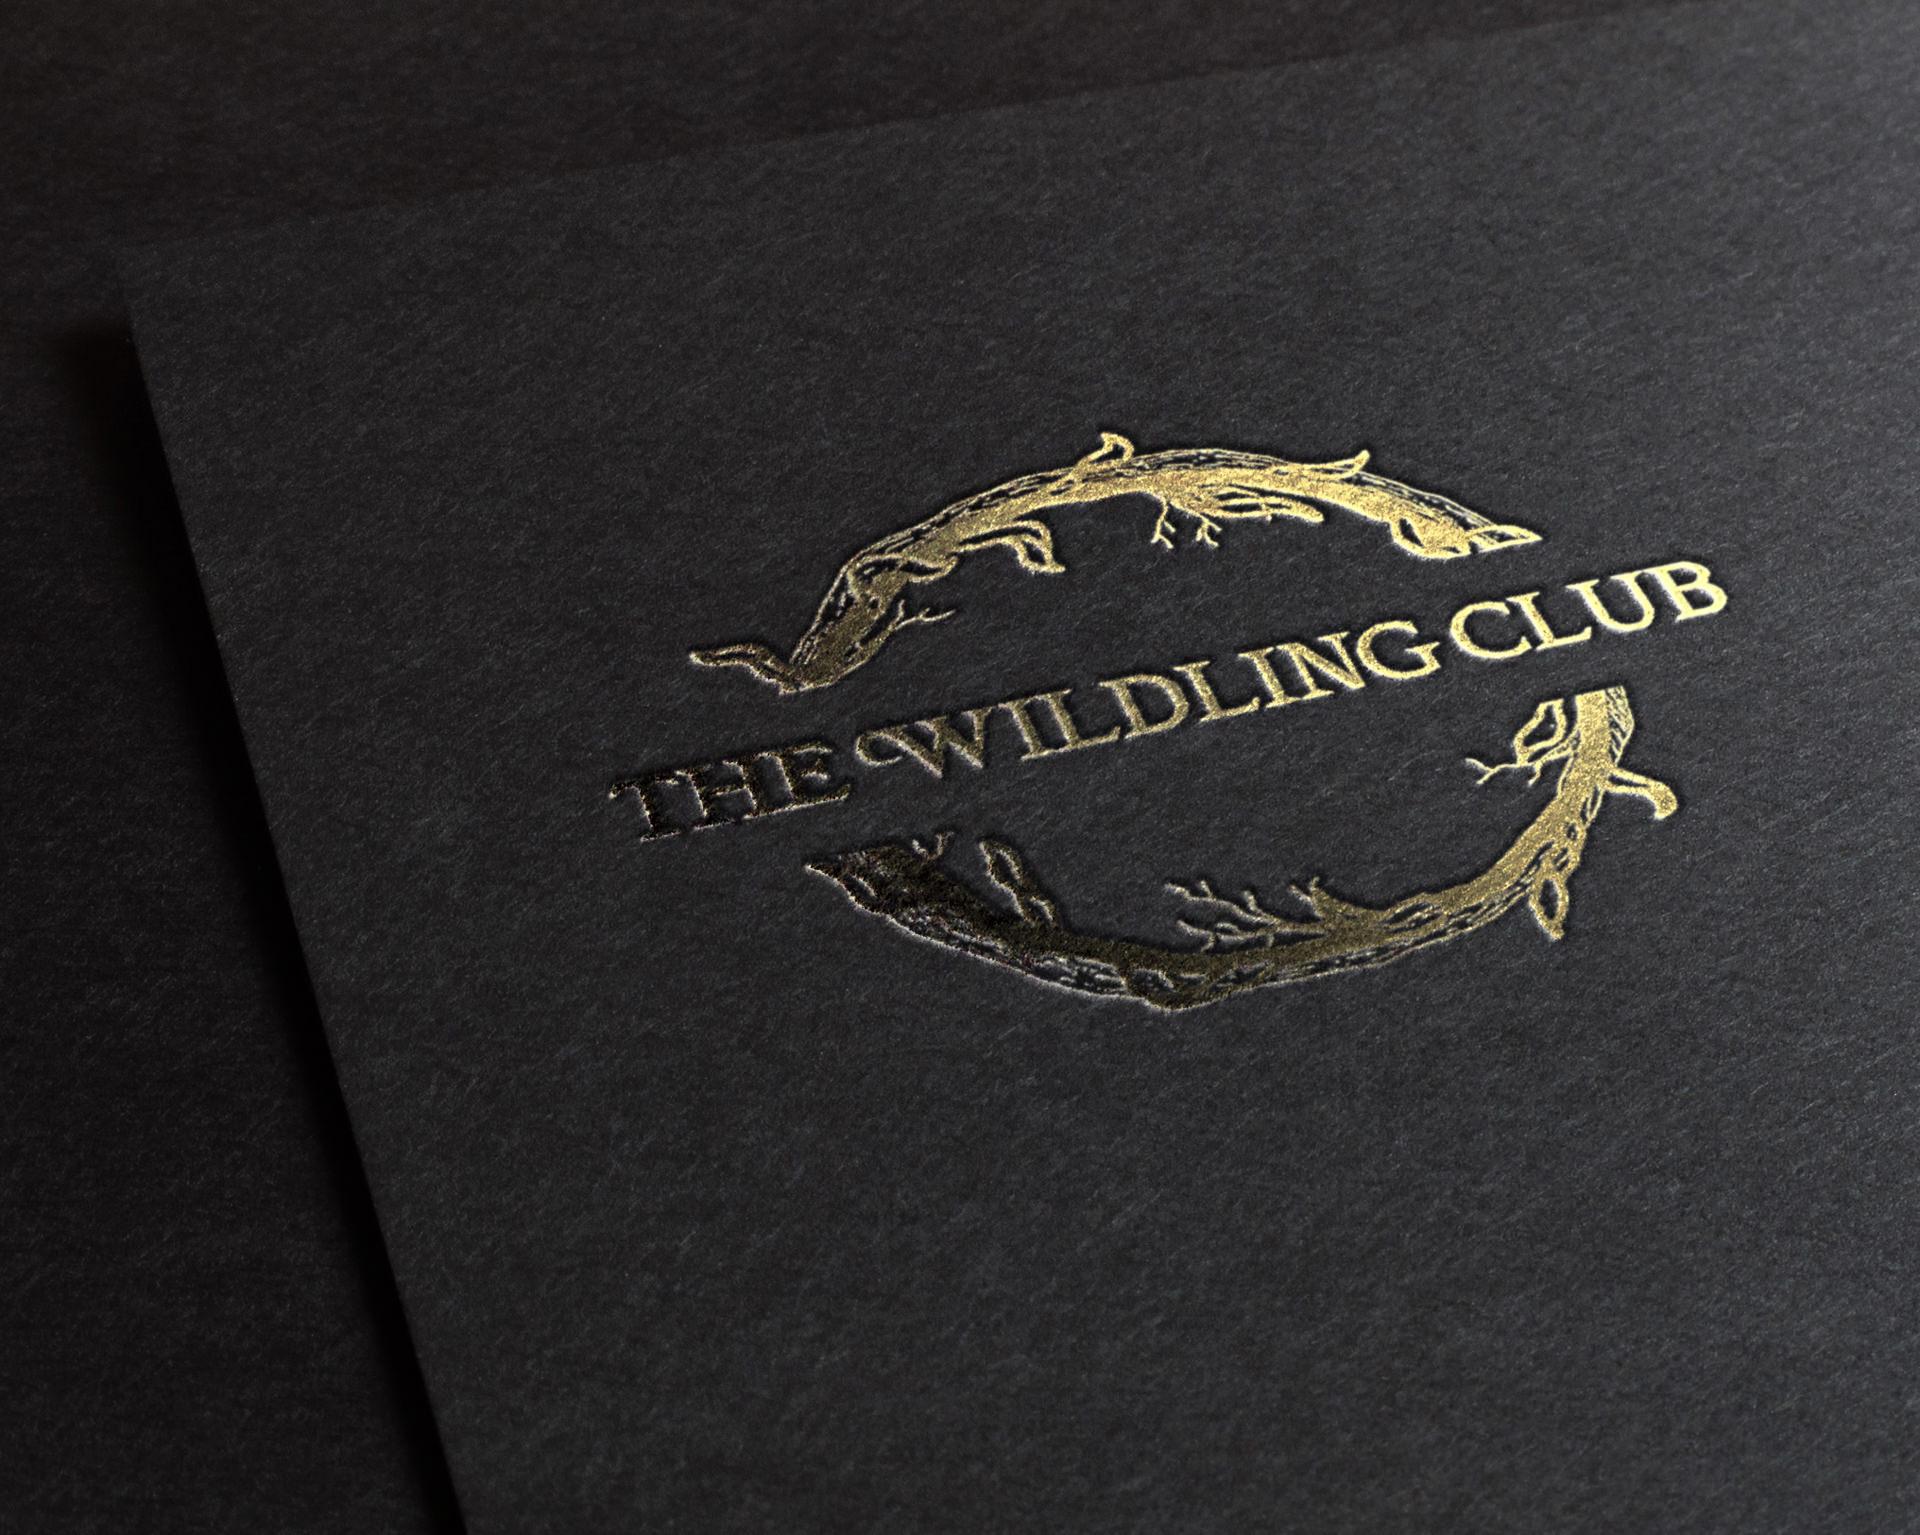 THE WILDLING CLUB LOGO GOLD FOIL_1.jpg